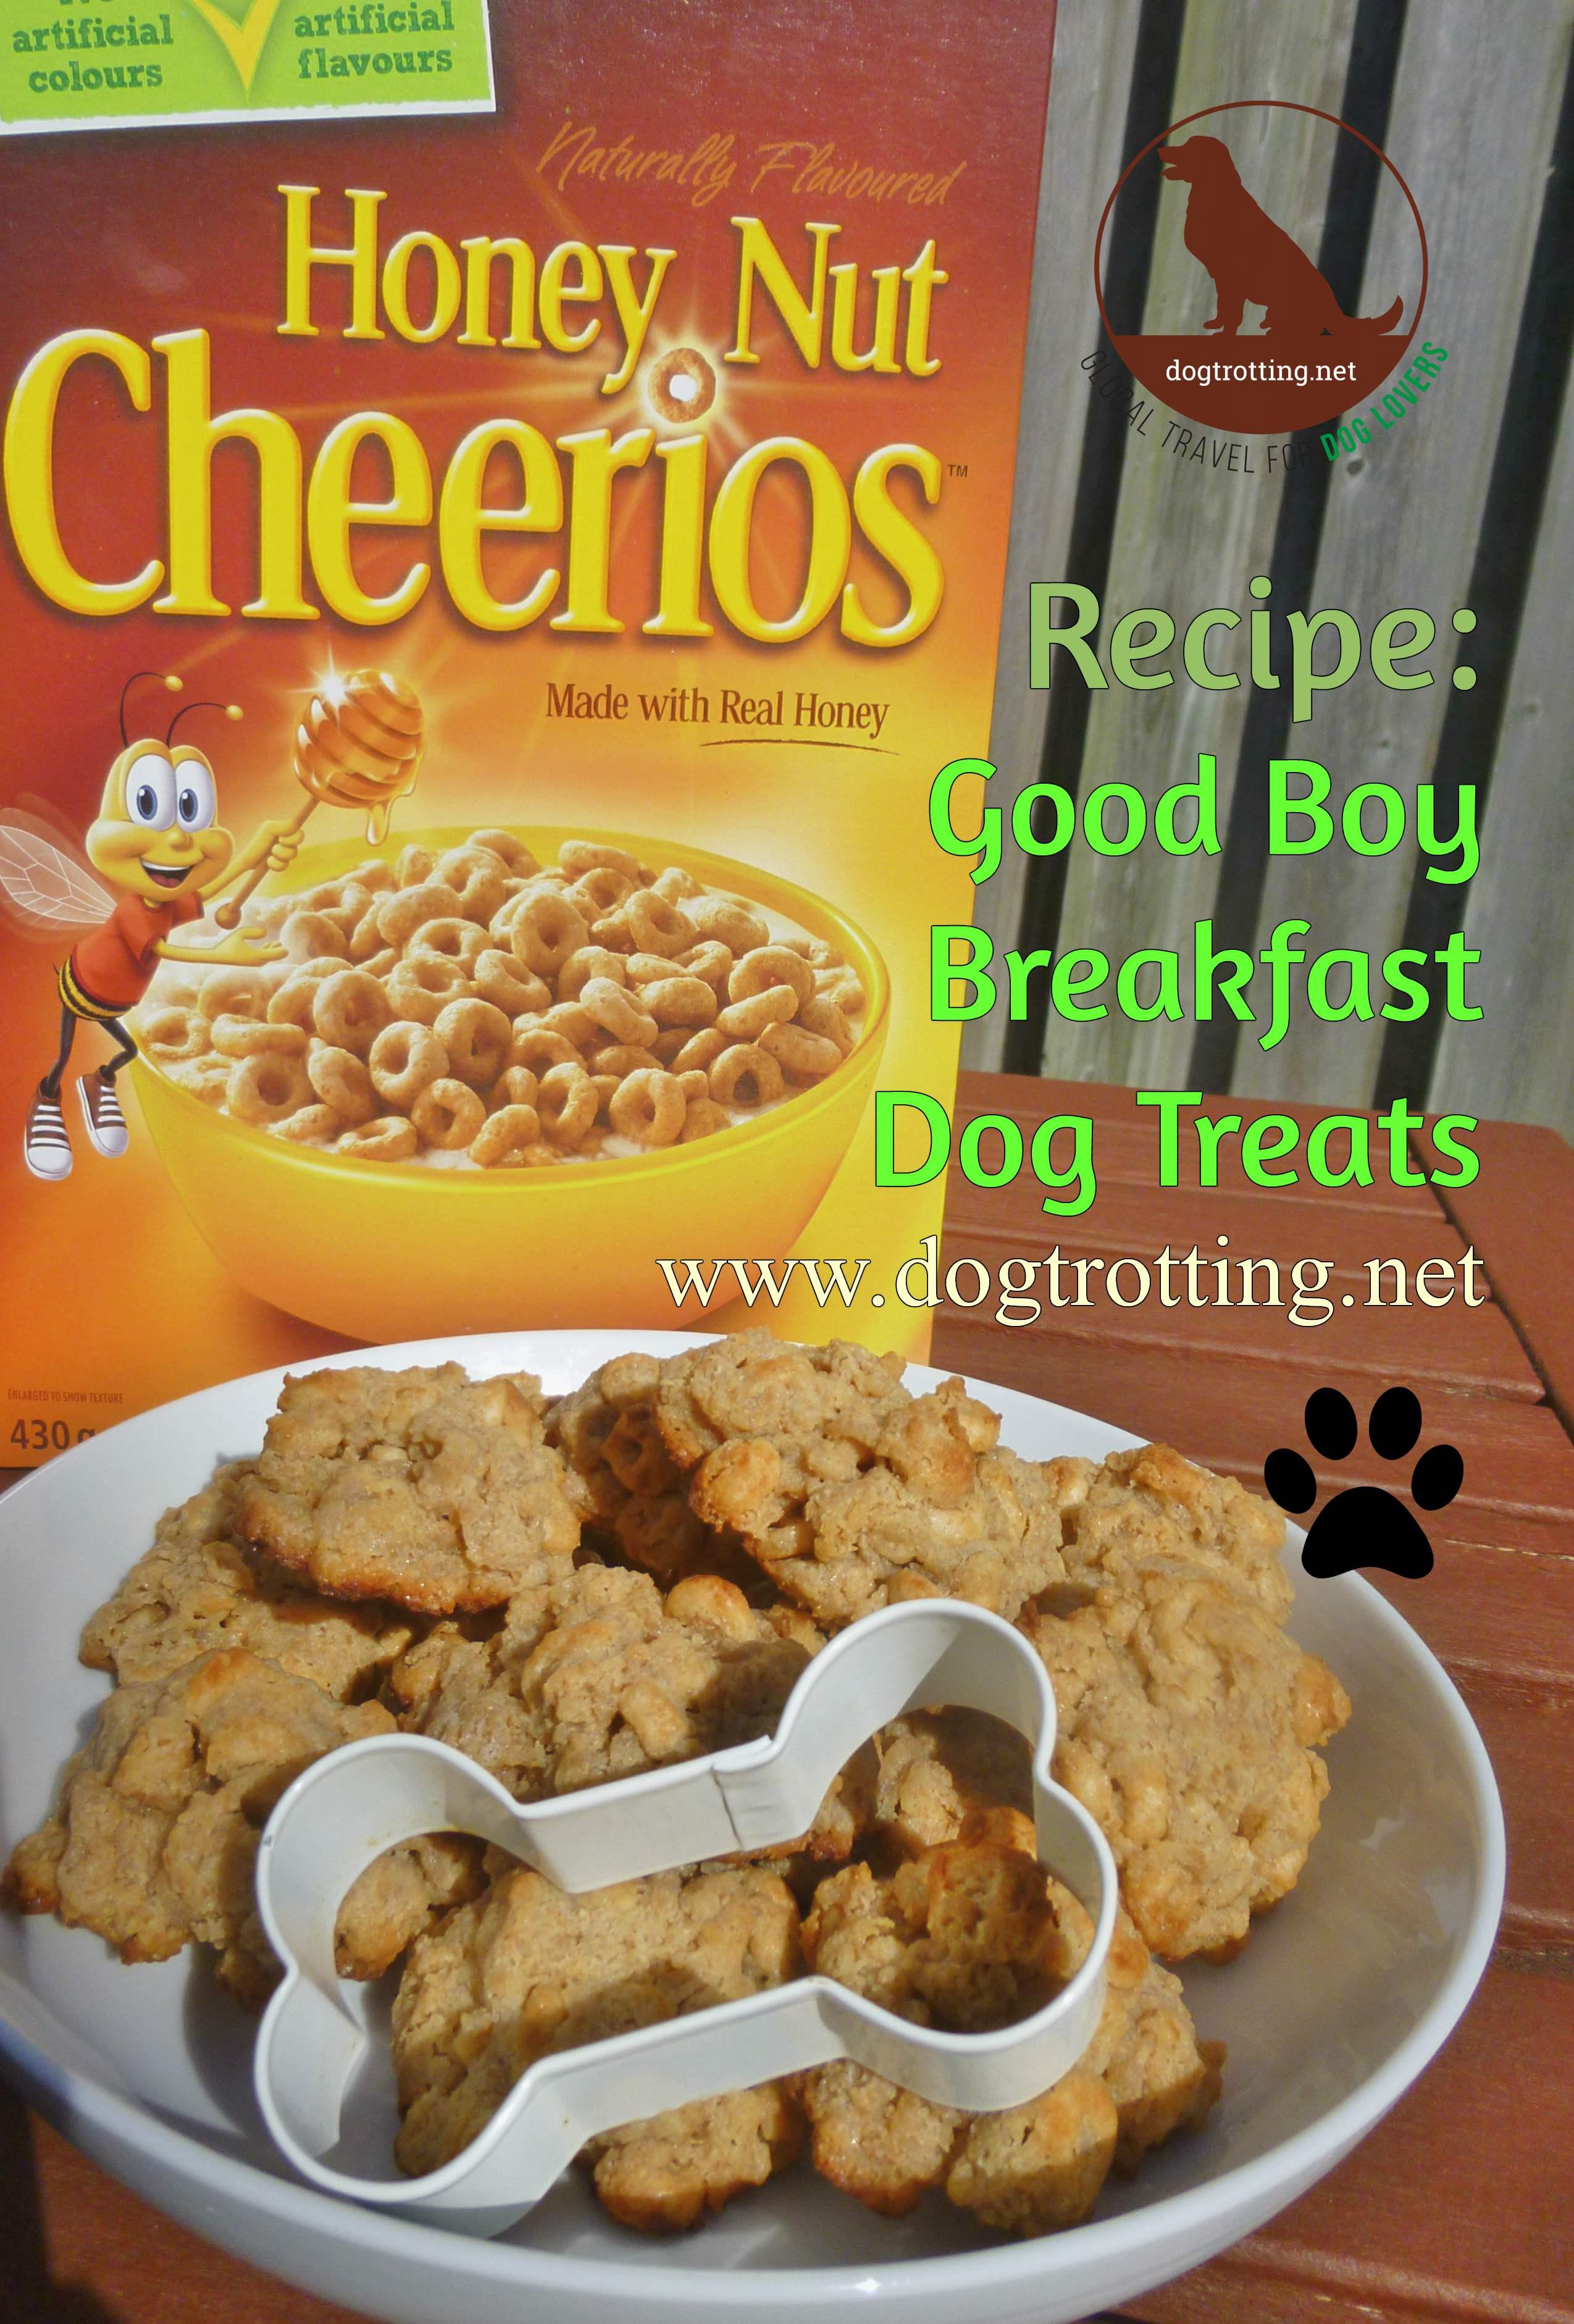 recipe for dog treats made from cheerios